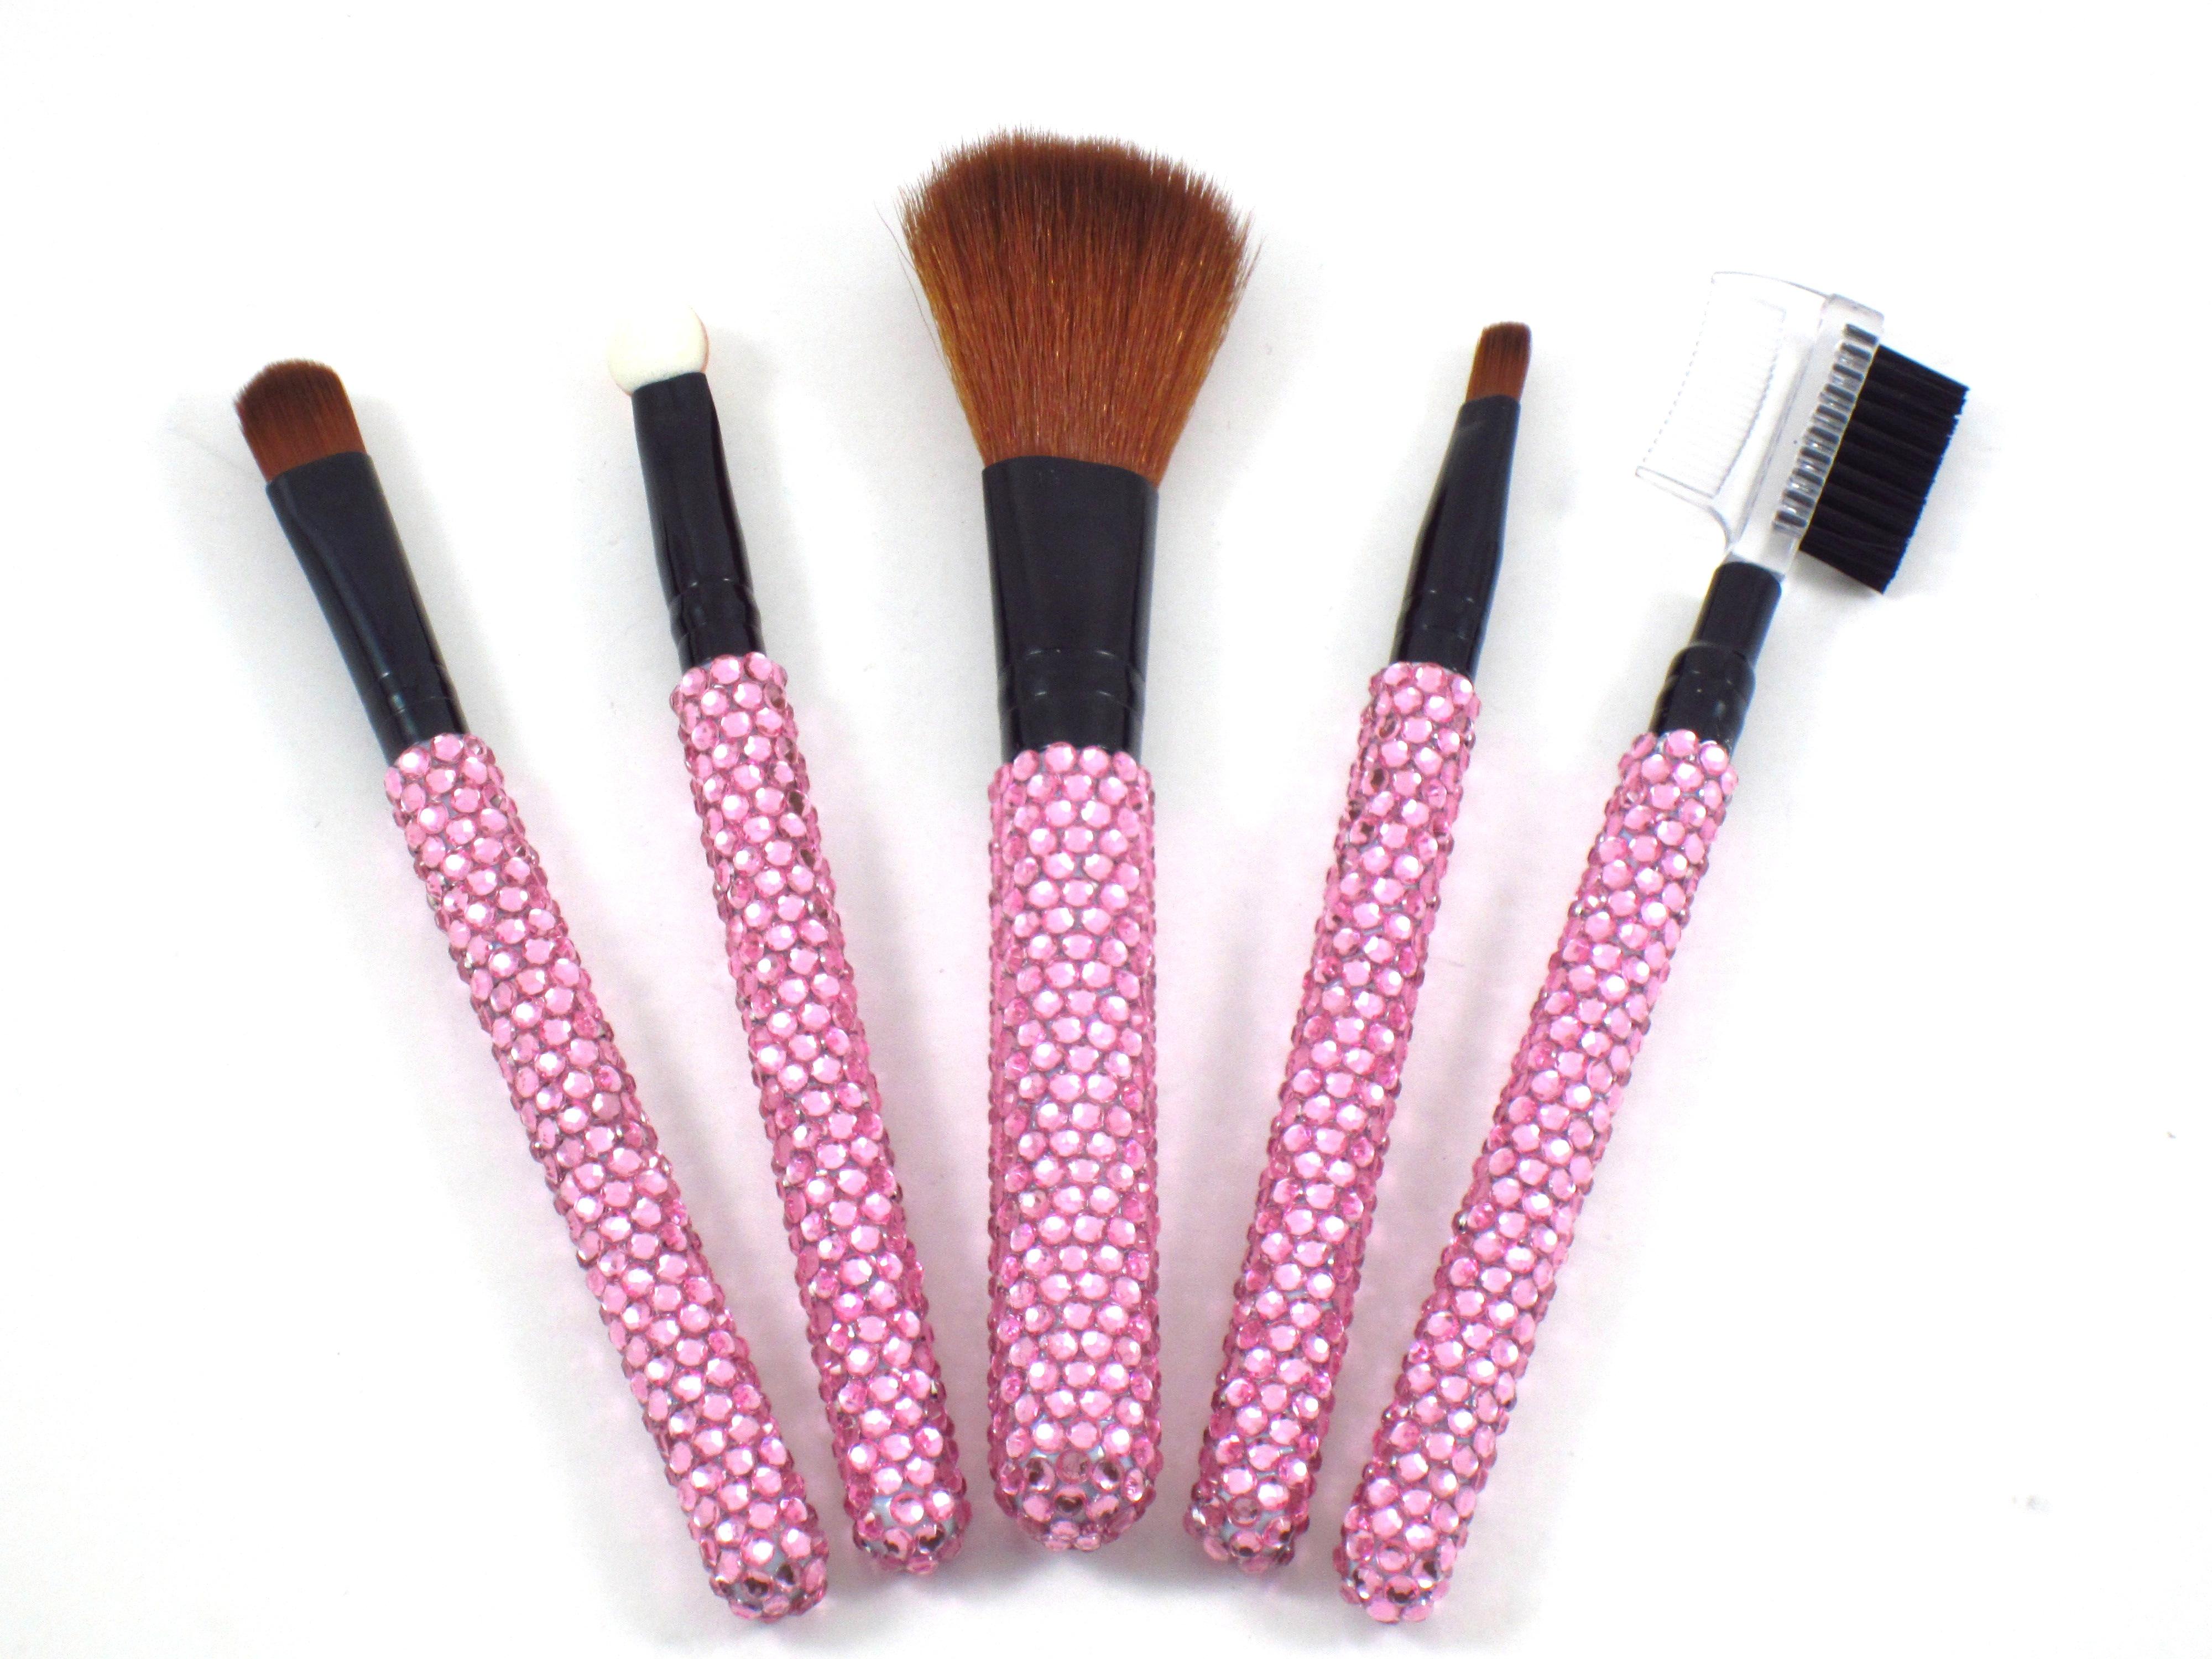 Light Pink Crystal Rhinestone Bling Embellished Cosmetic Makeup Brush Set | eBay